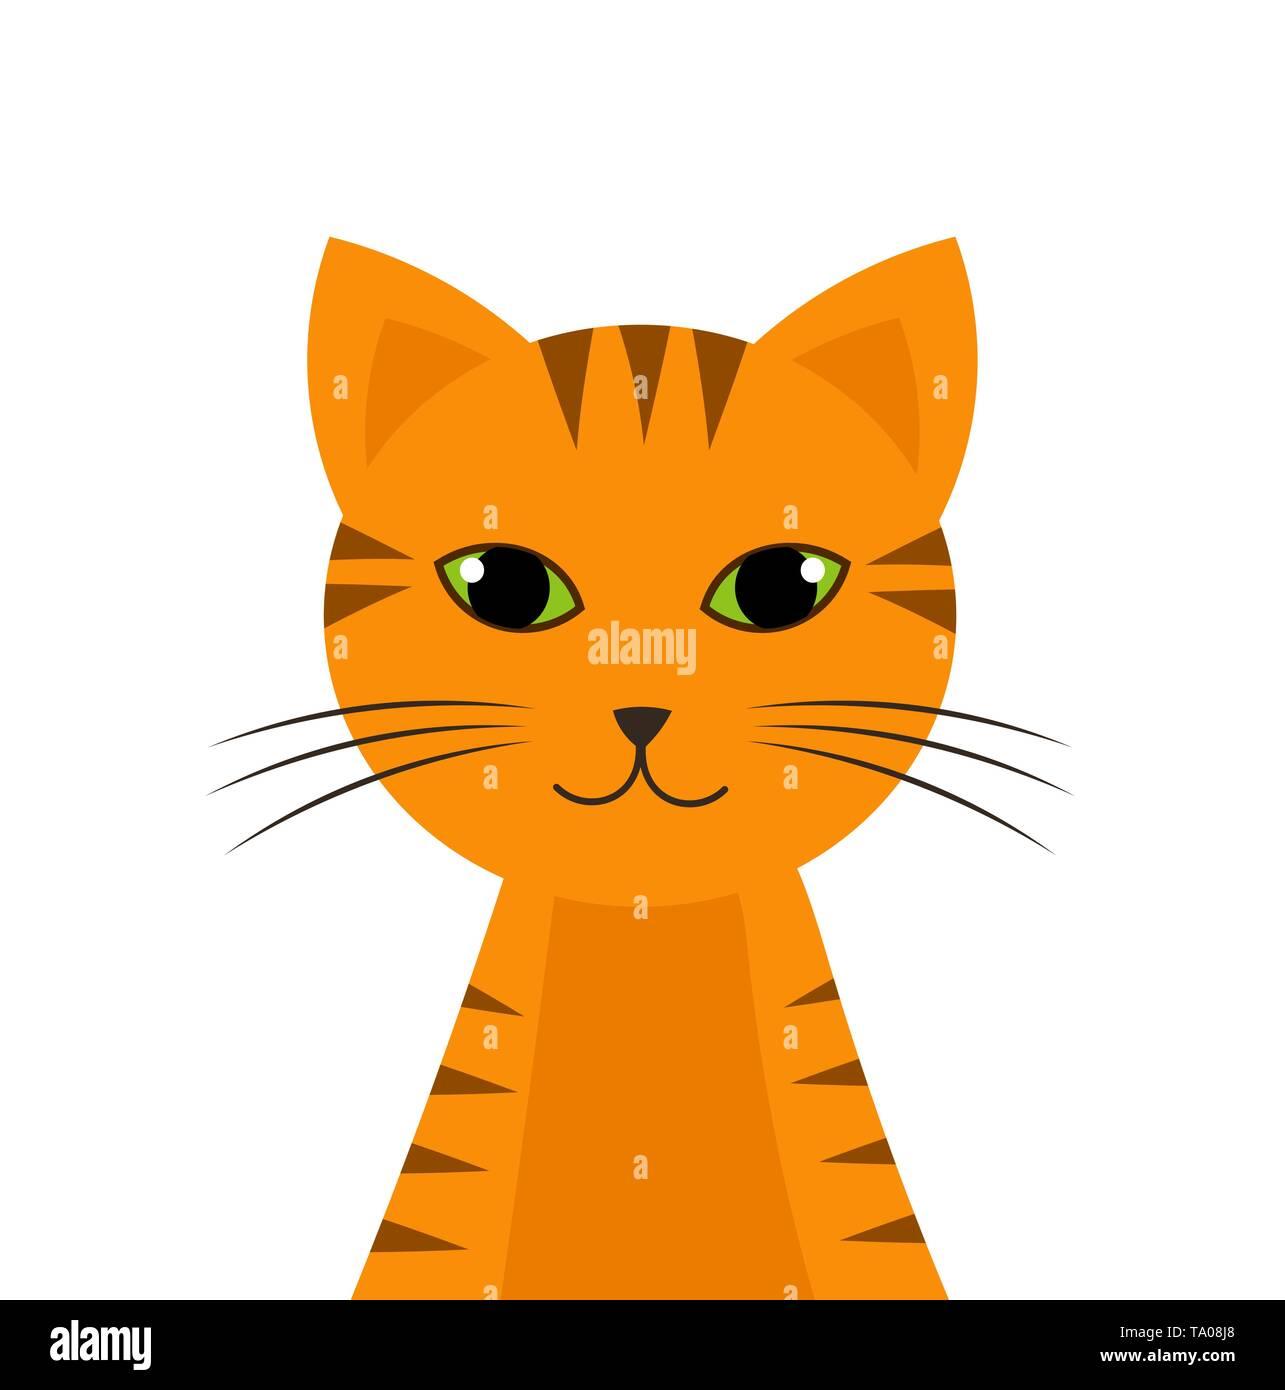 Ginger tiger cat. Vector illustration - Stock Image